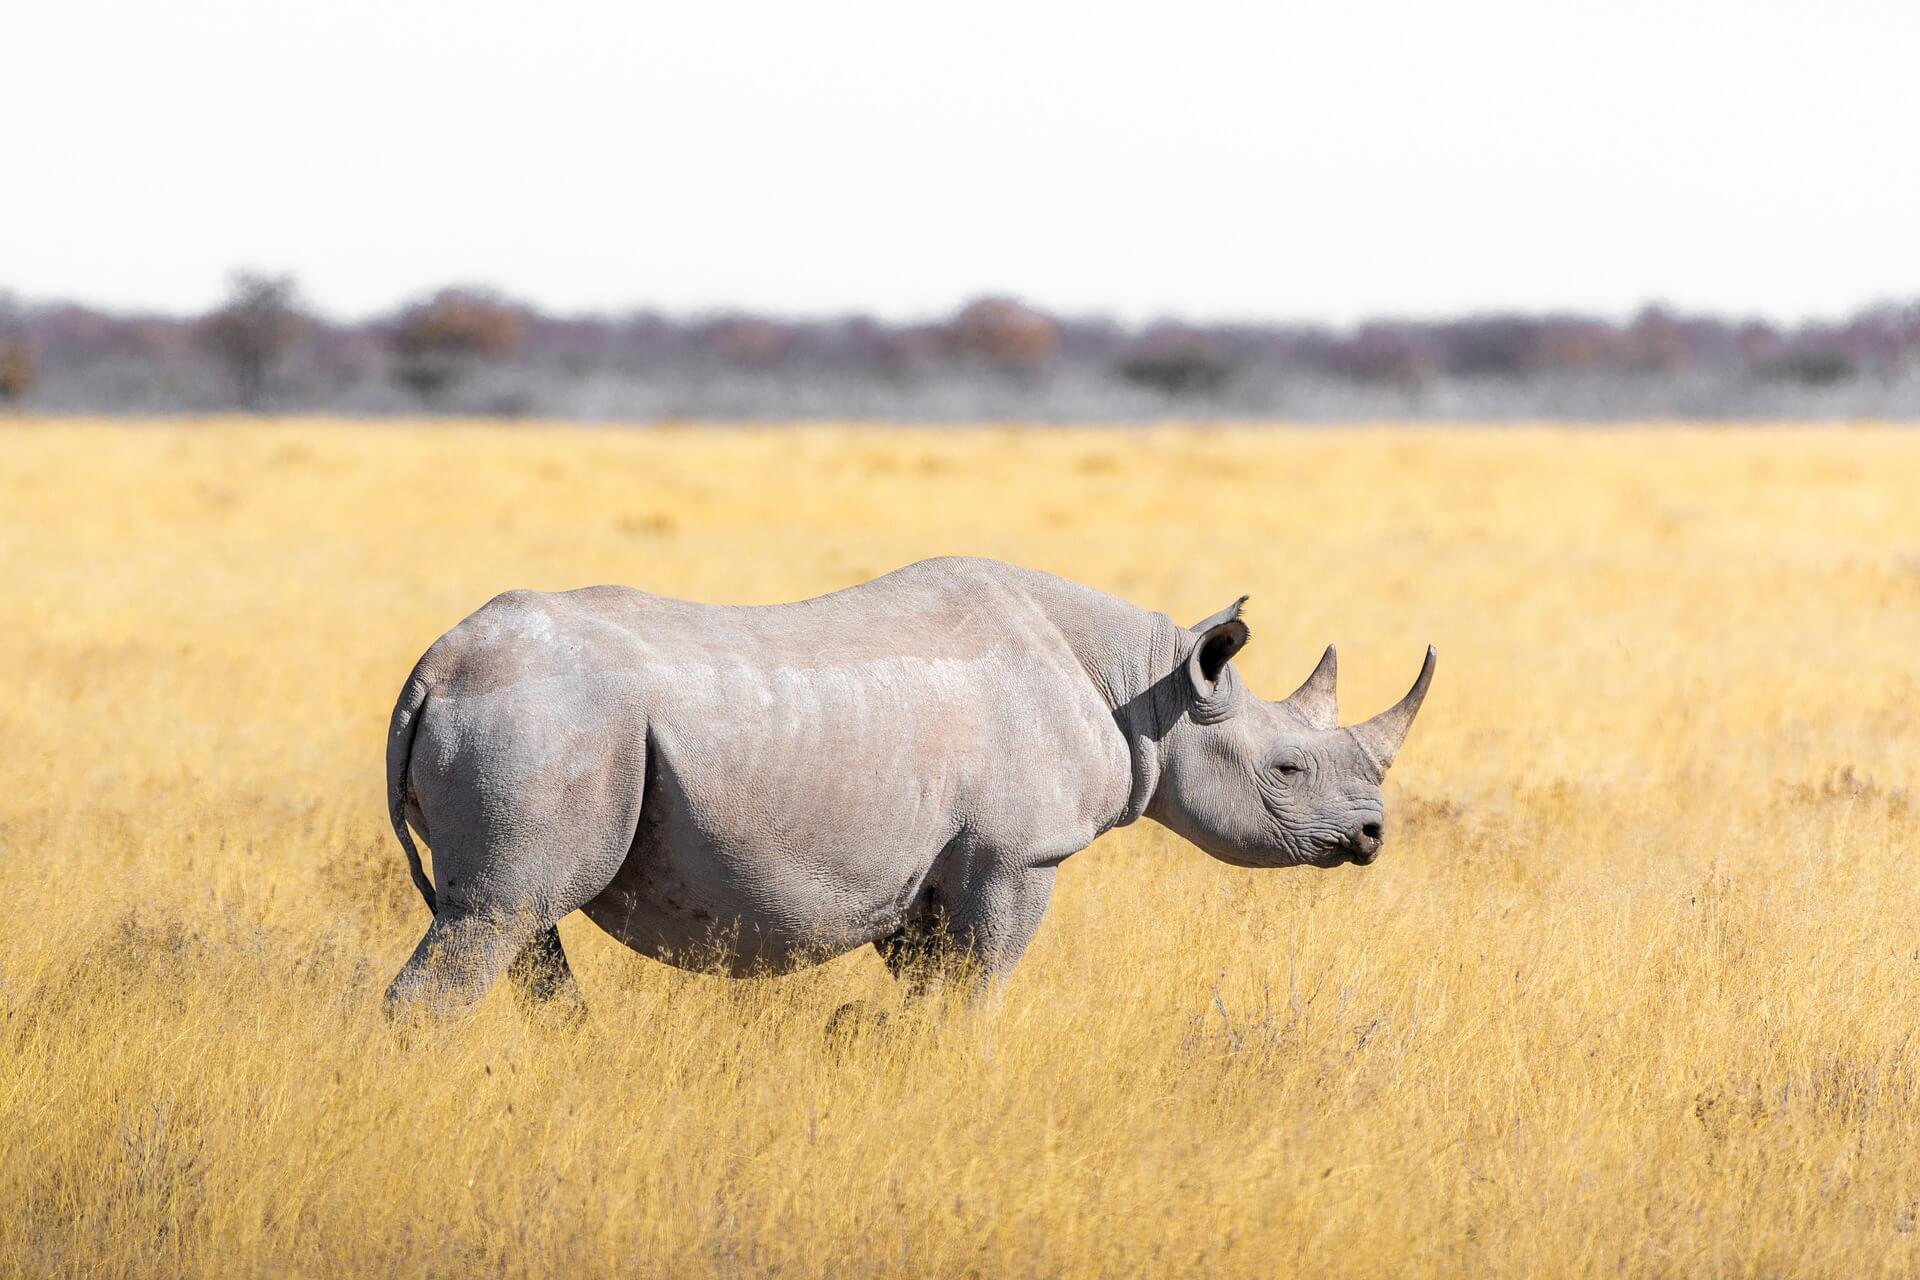 Rinoceronte, dónde ver safaris virtuales – Bichito viajero